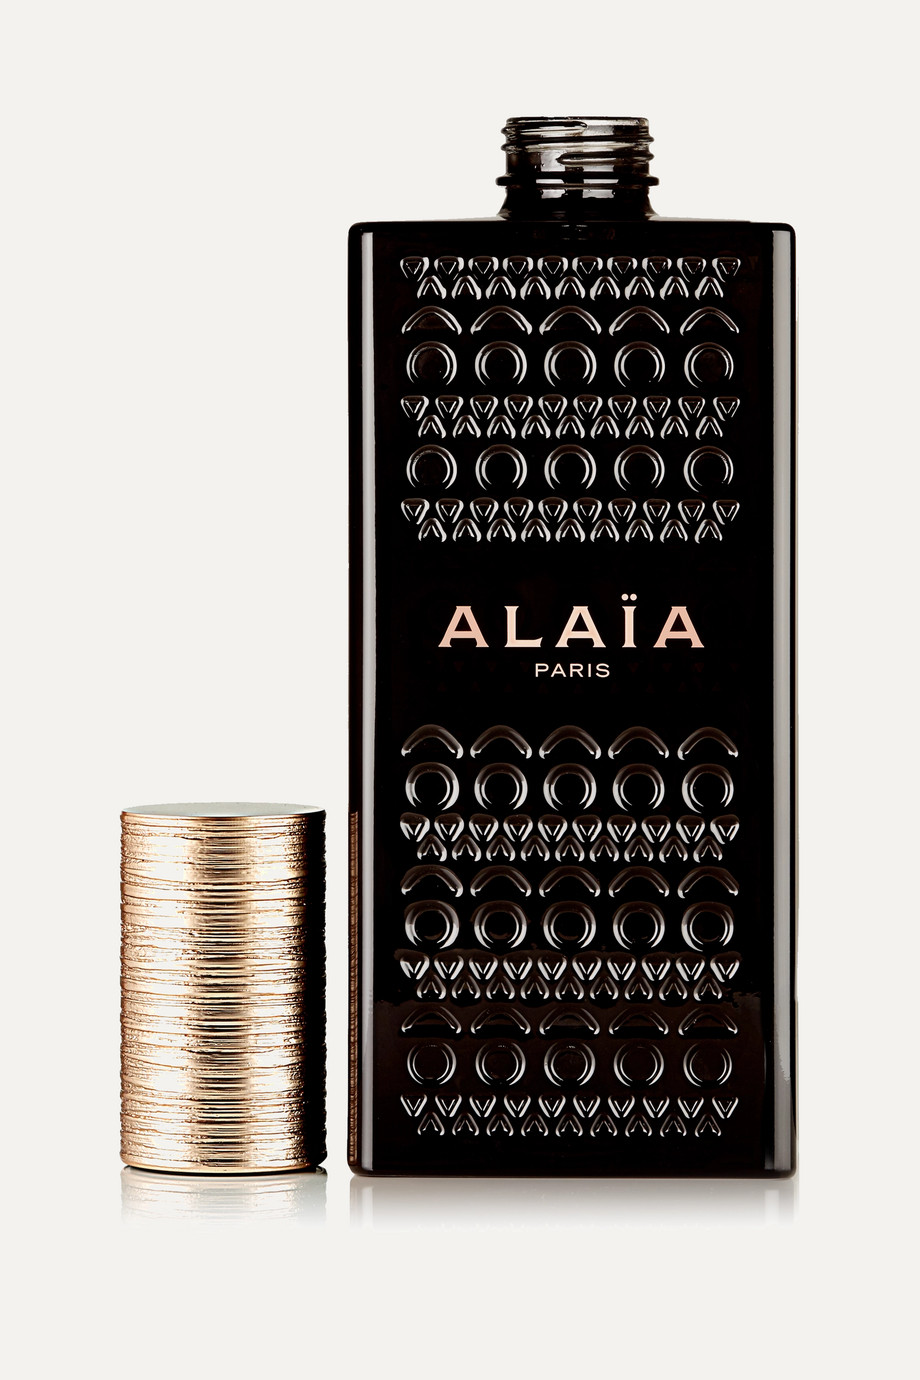 Alaïa Beauty ALAÏA PARIS, 1000 ml – Eau de Parfum